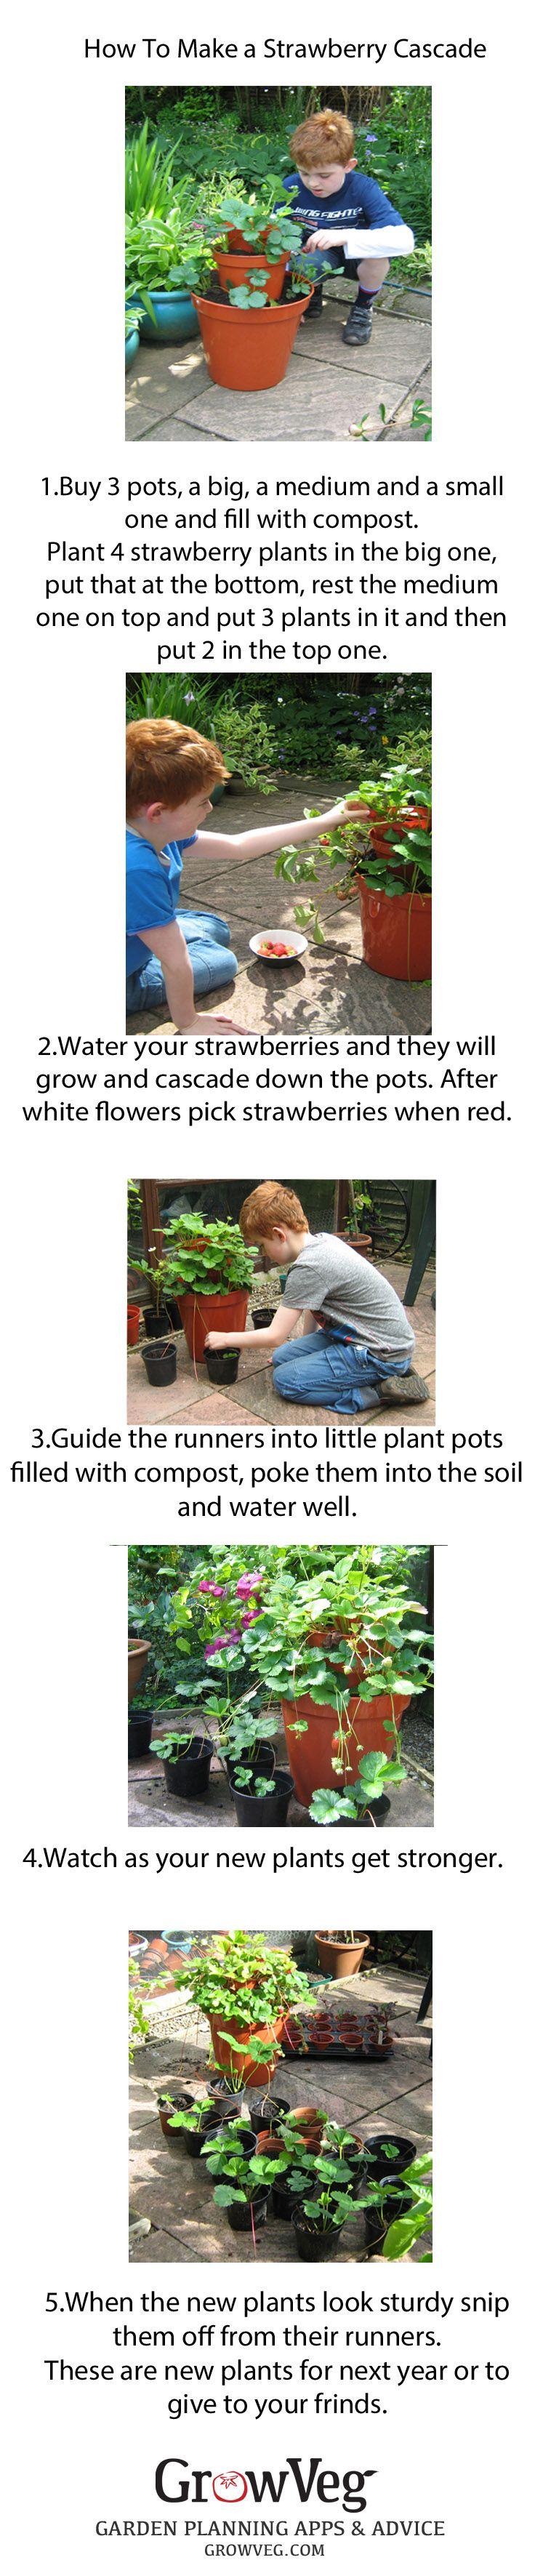 how to make a strawberry pot